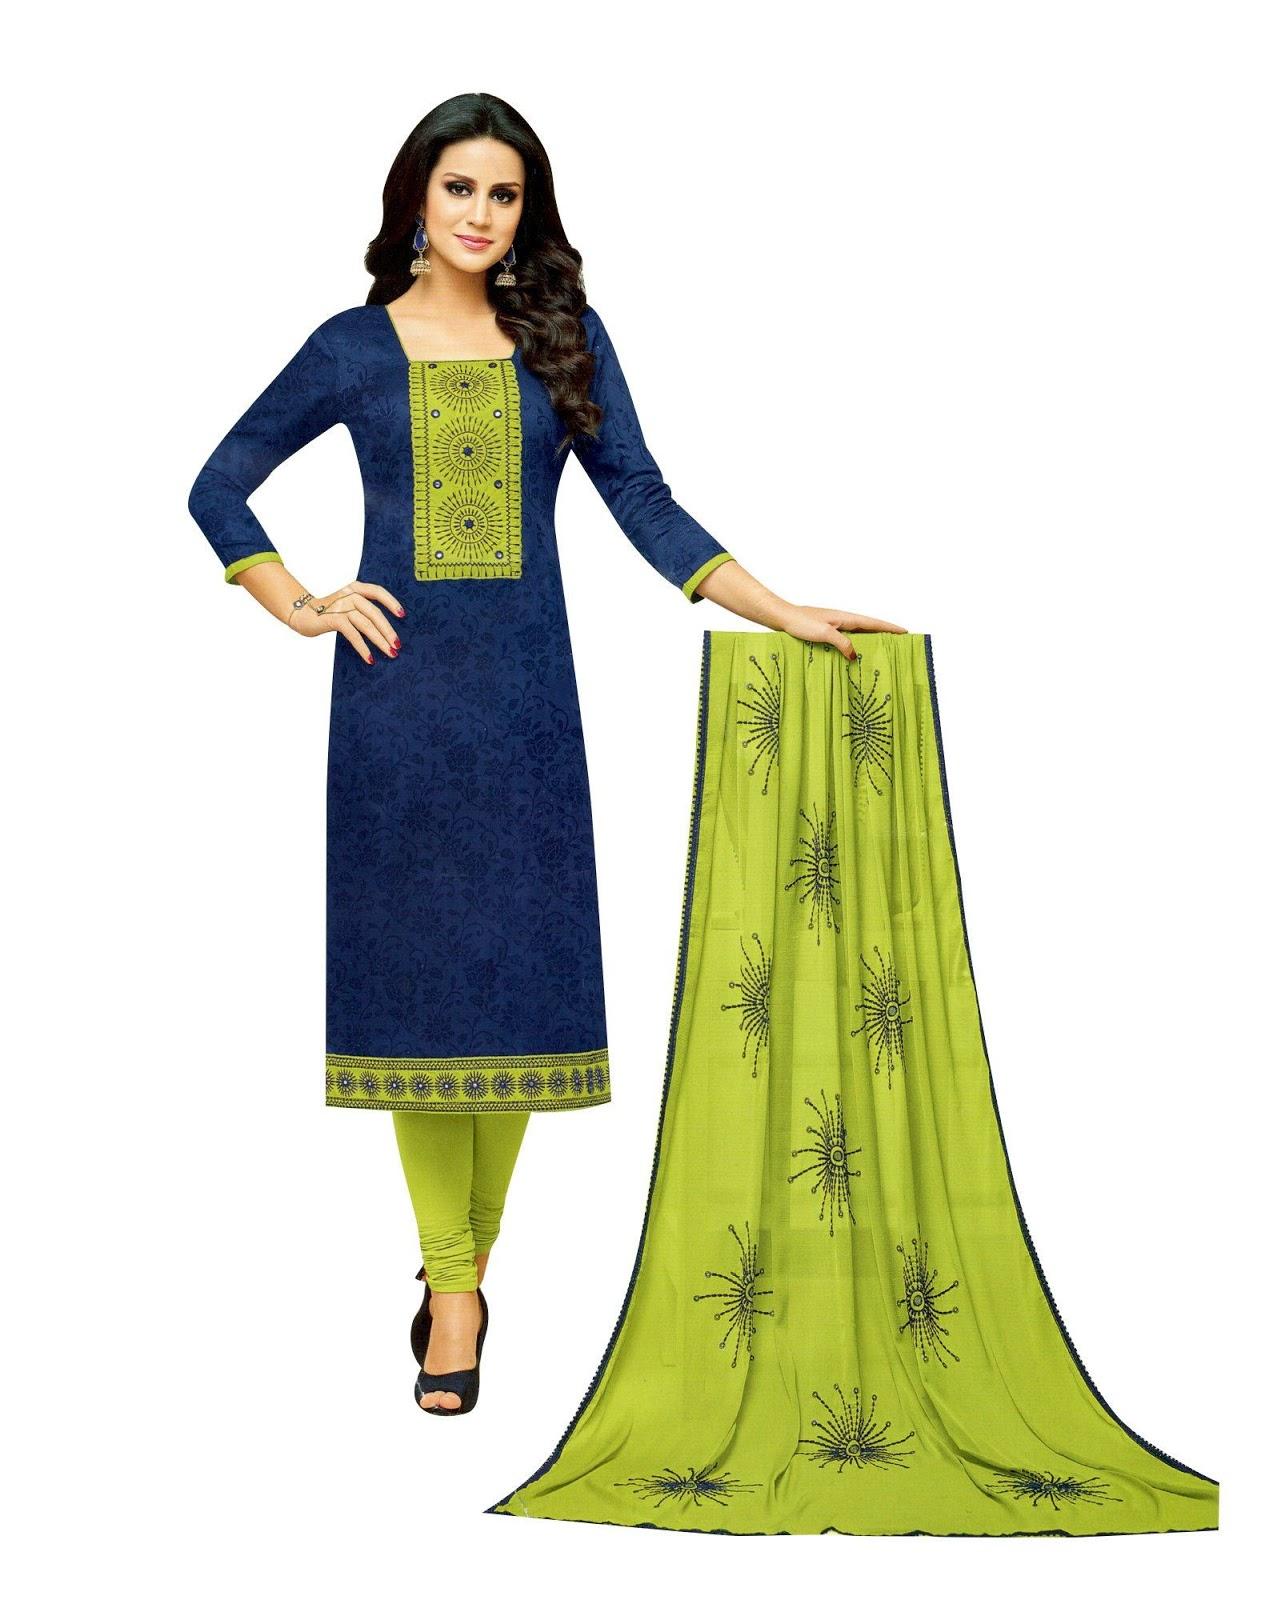 Salwar Kameez Neck Designs Catalogue (144)